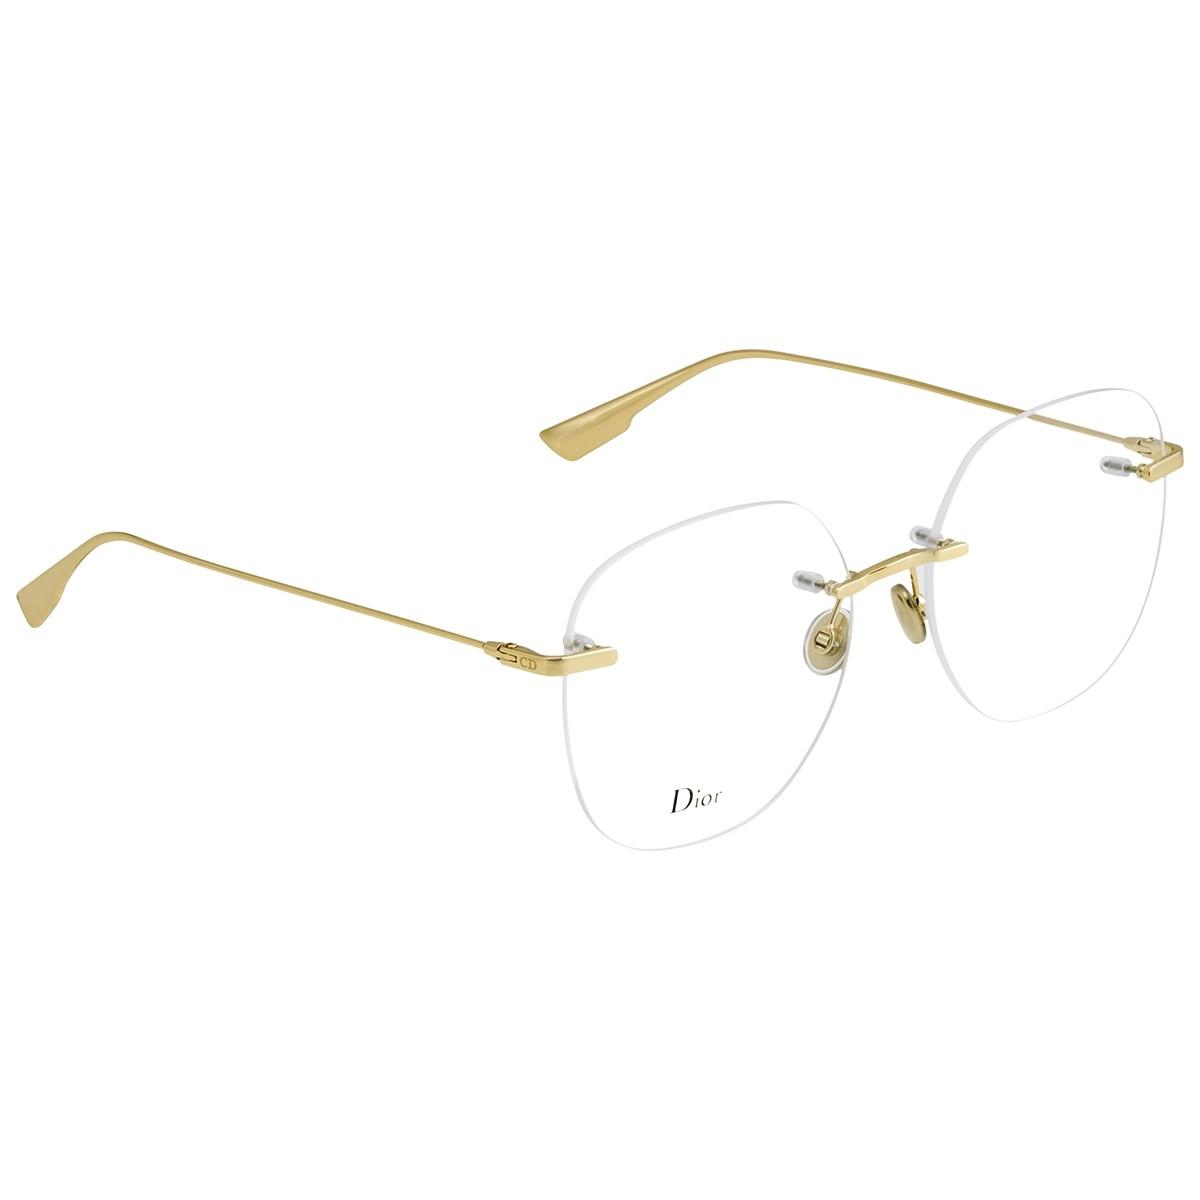 Dior 迪奥 无框镜架眼镜 STELLAIREO6DBB